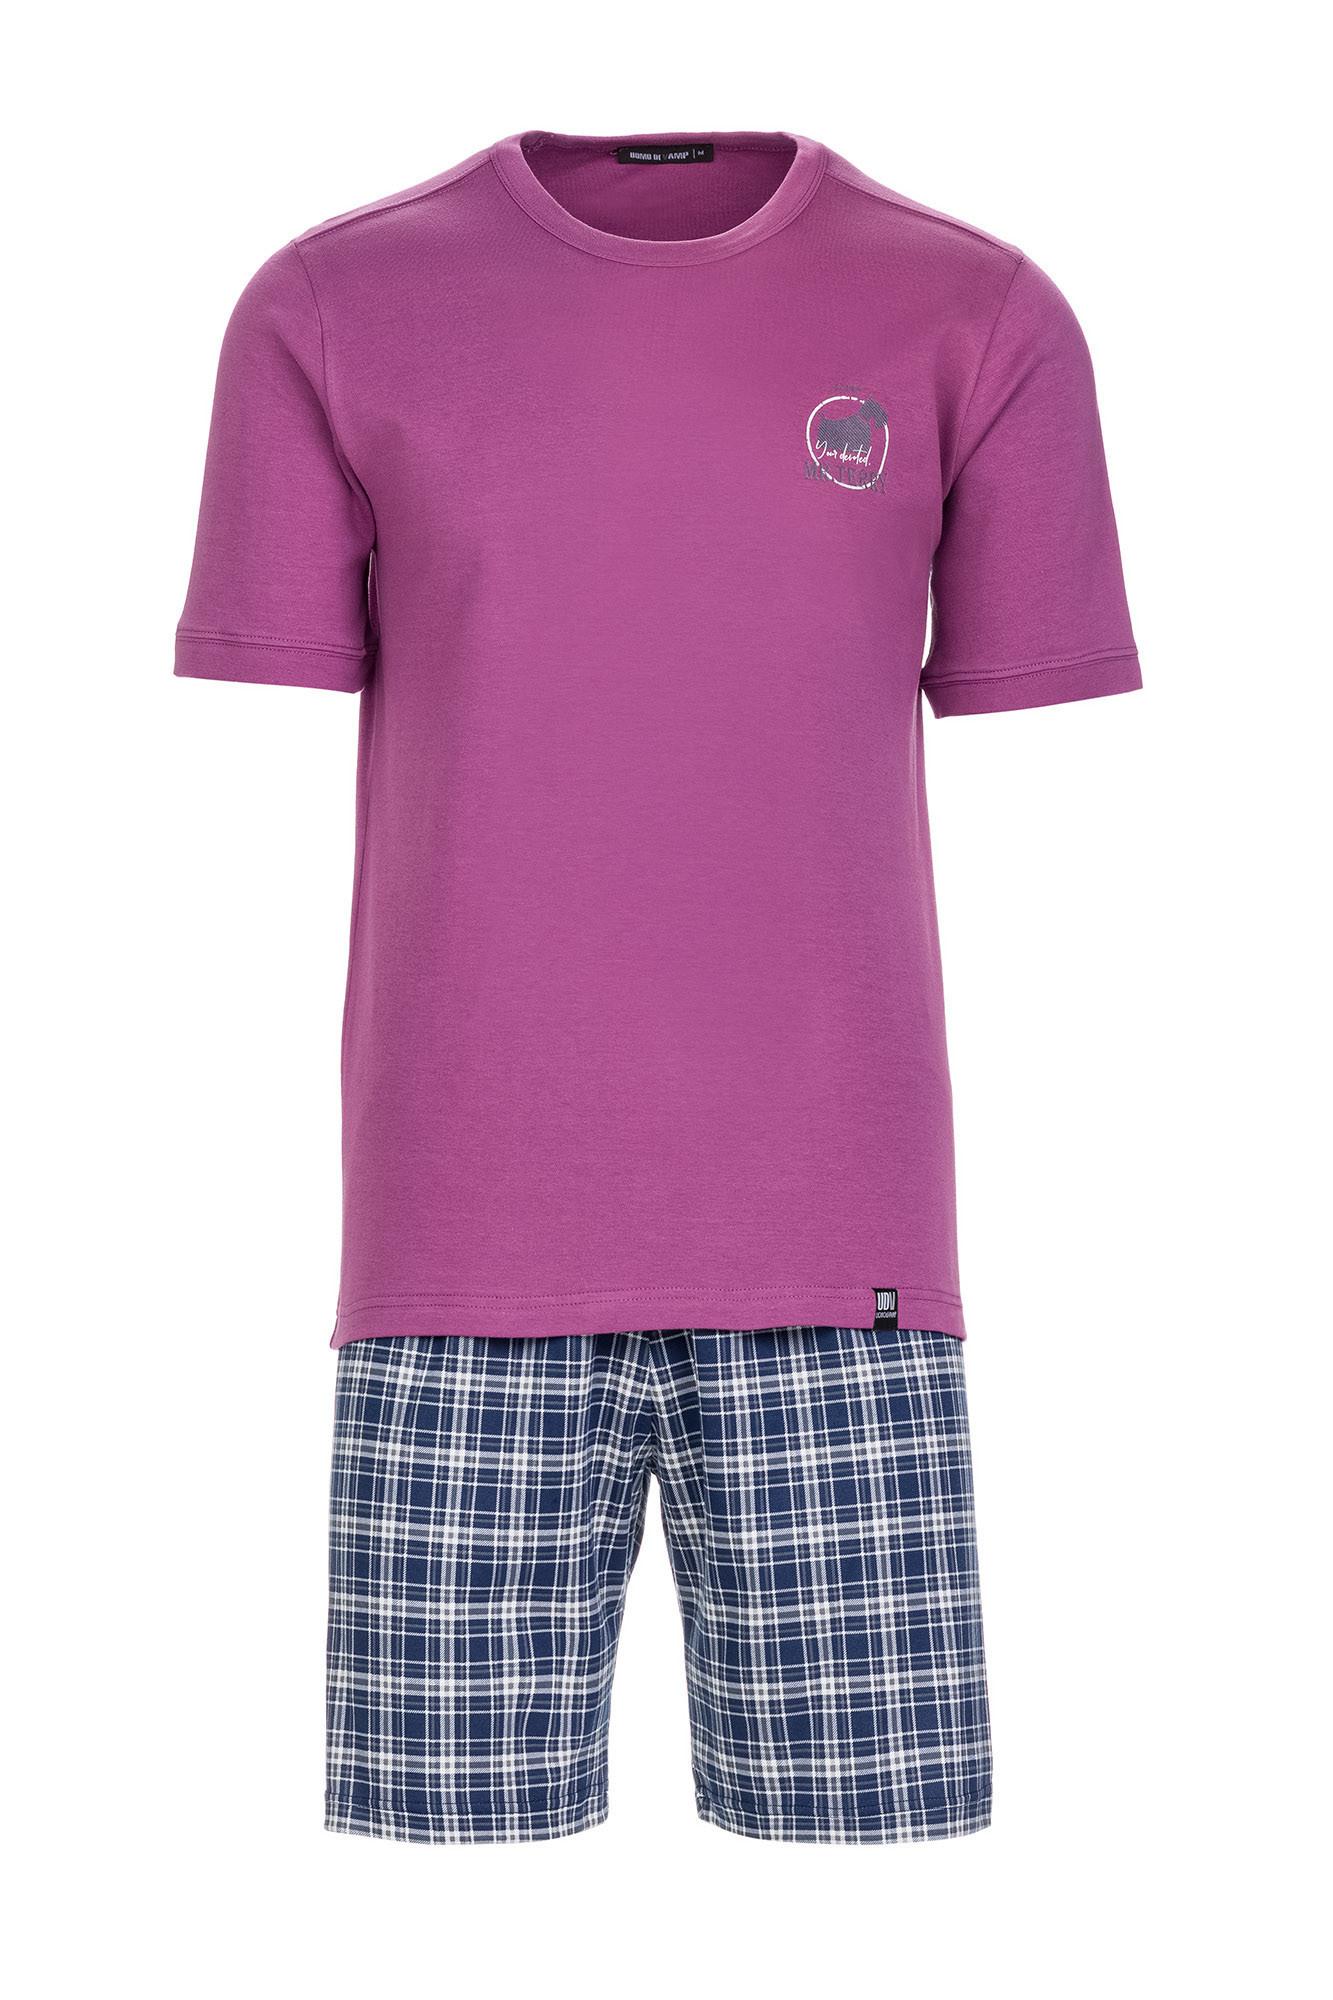 Vamp - Pánske pohodlné pyžamo 13702 - Vamp purple royal m